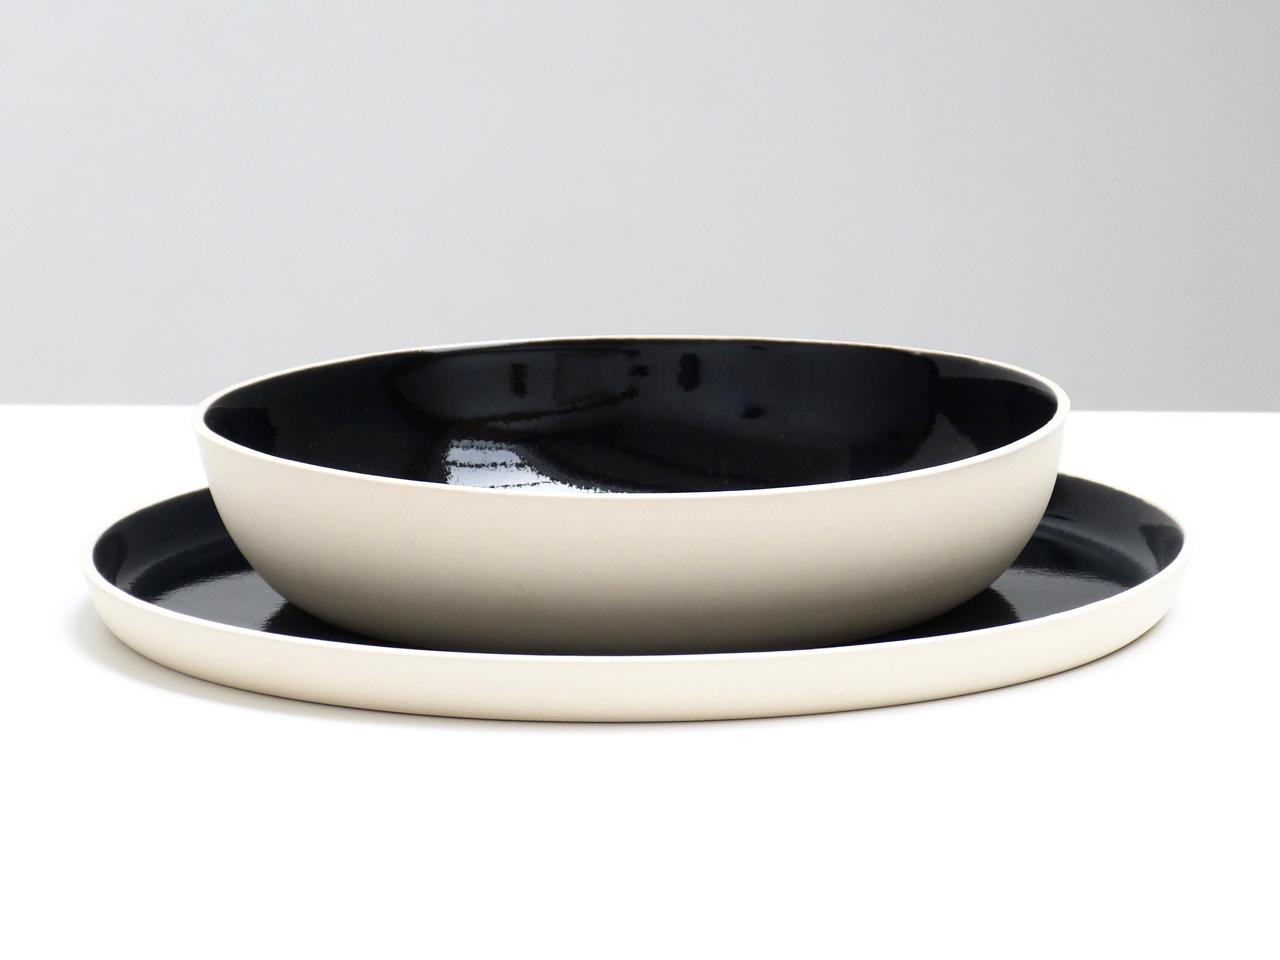 bOn tableware by Ilona van den bergh ceramics